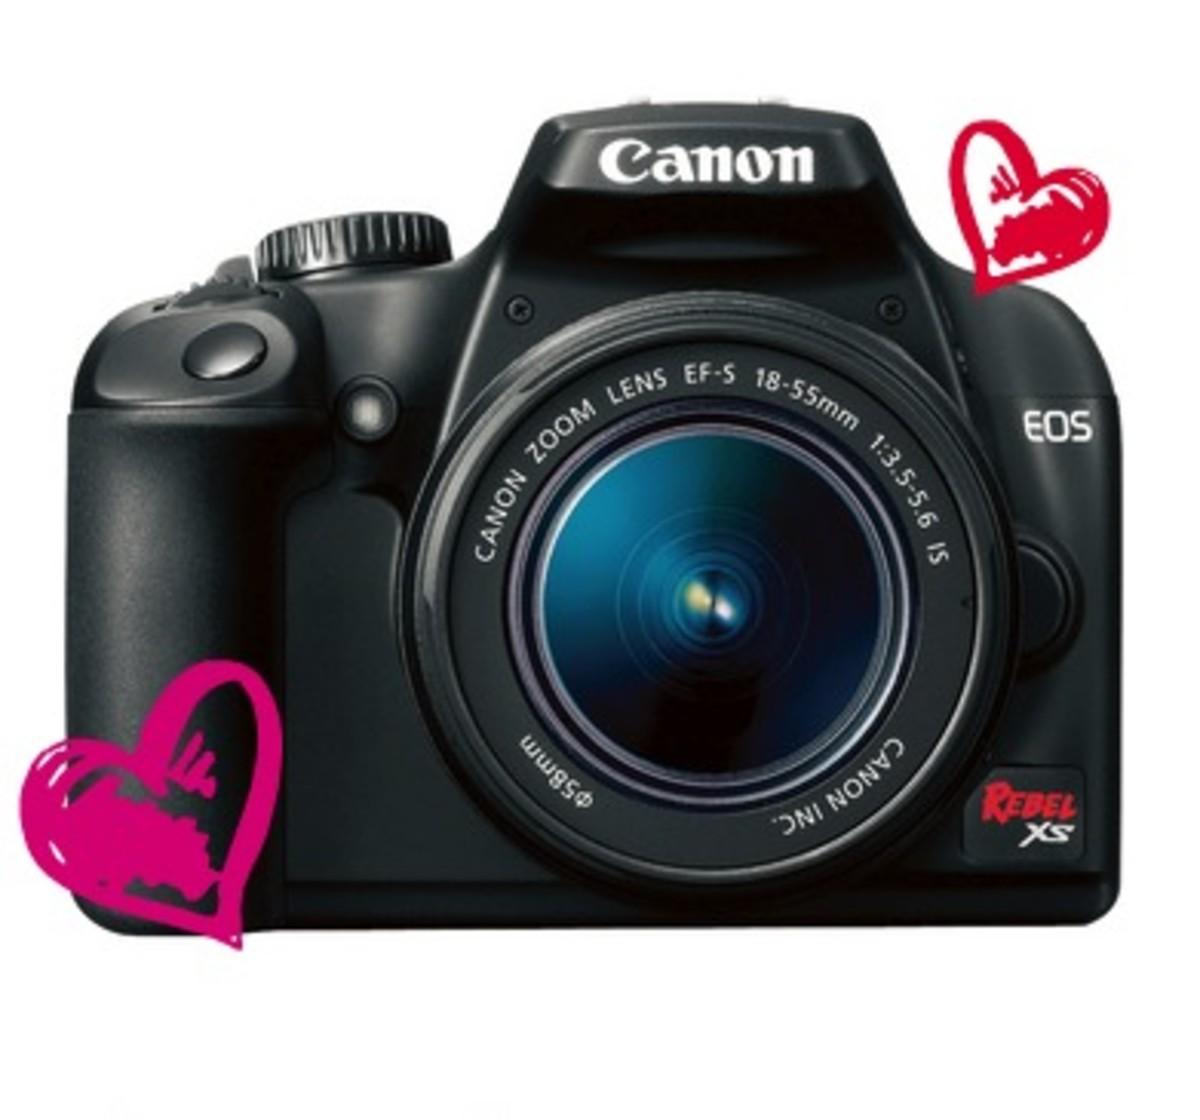 Camera Giveaway Image